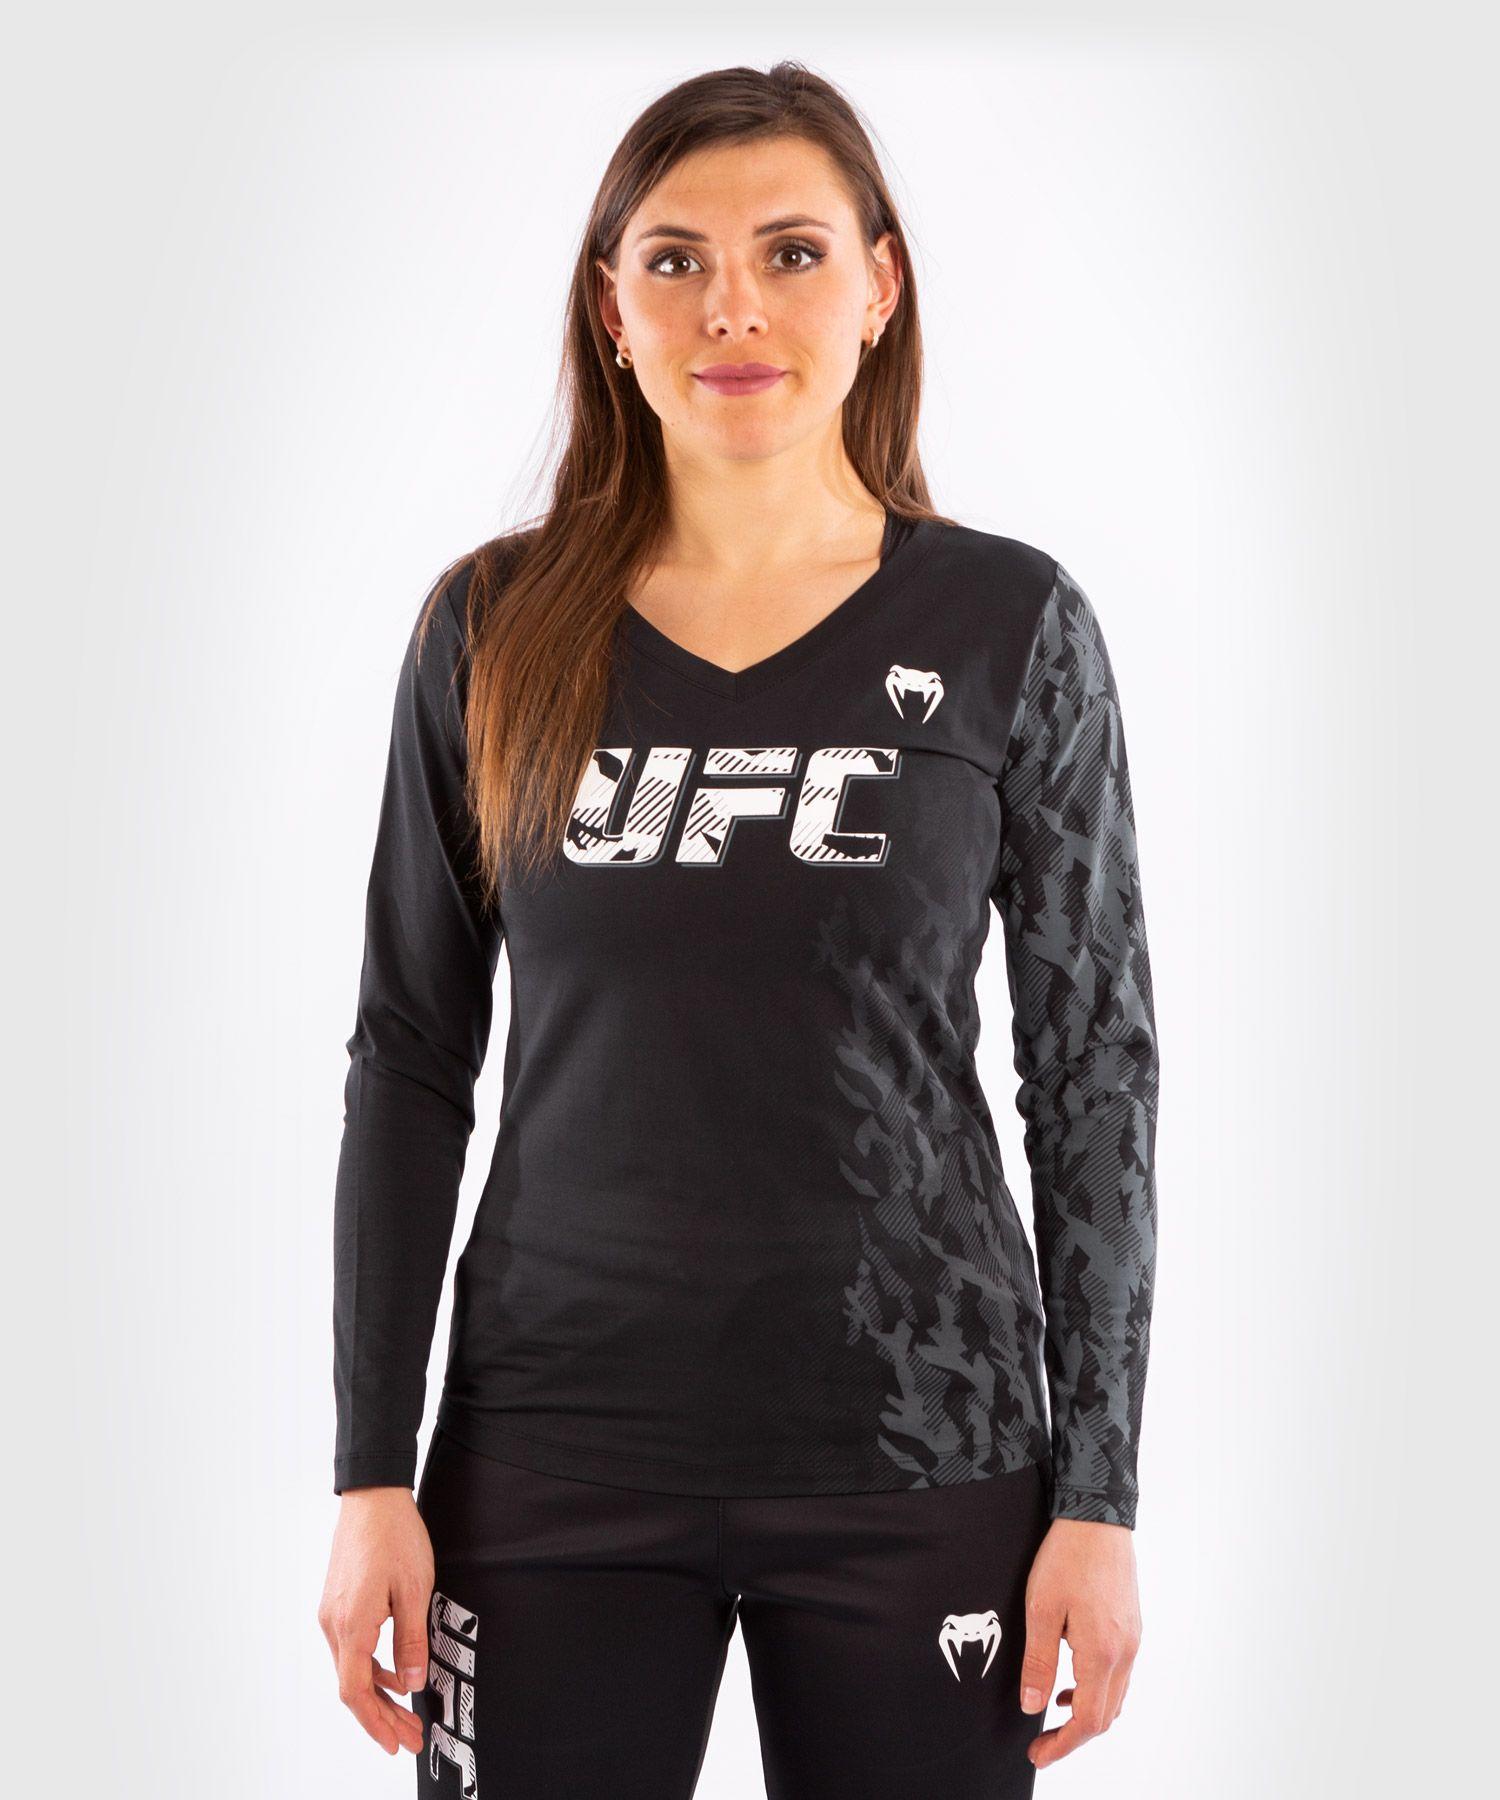 UFC Venum Authentic Fight Week Women's Long Sleeve T-shirt - Black